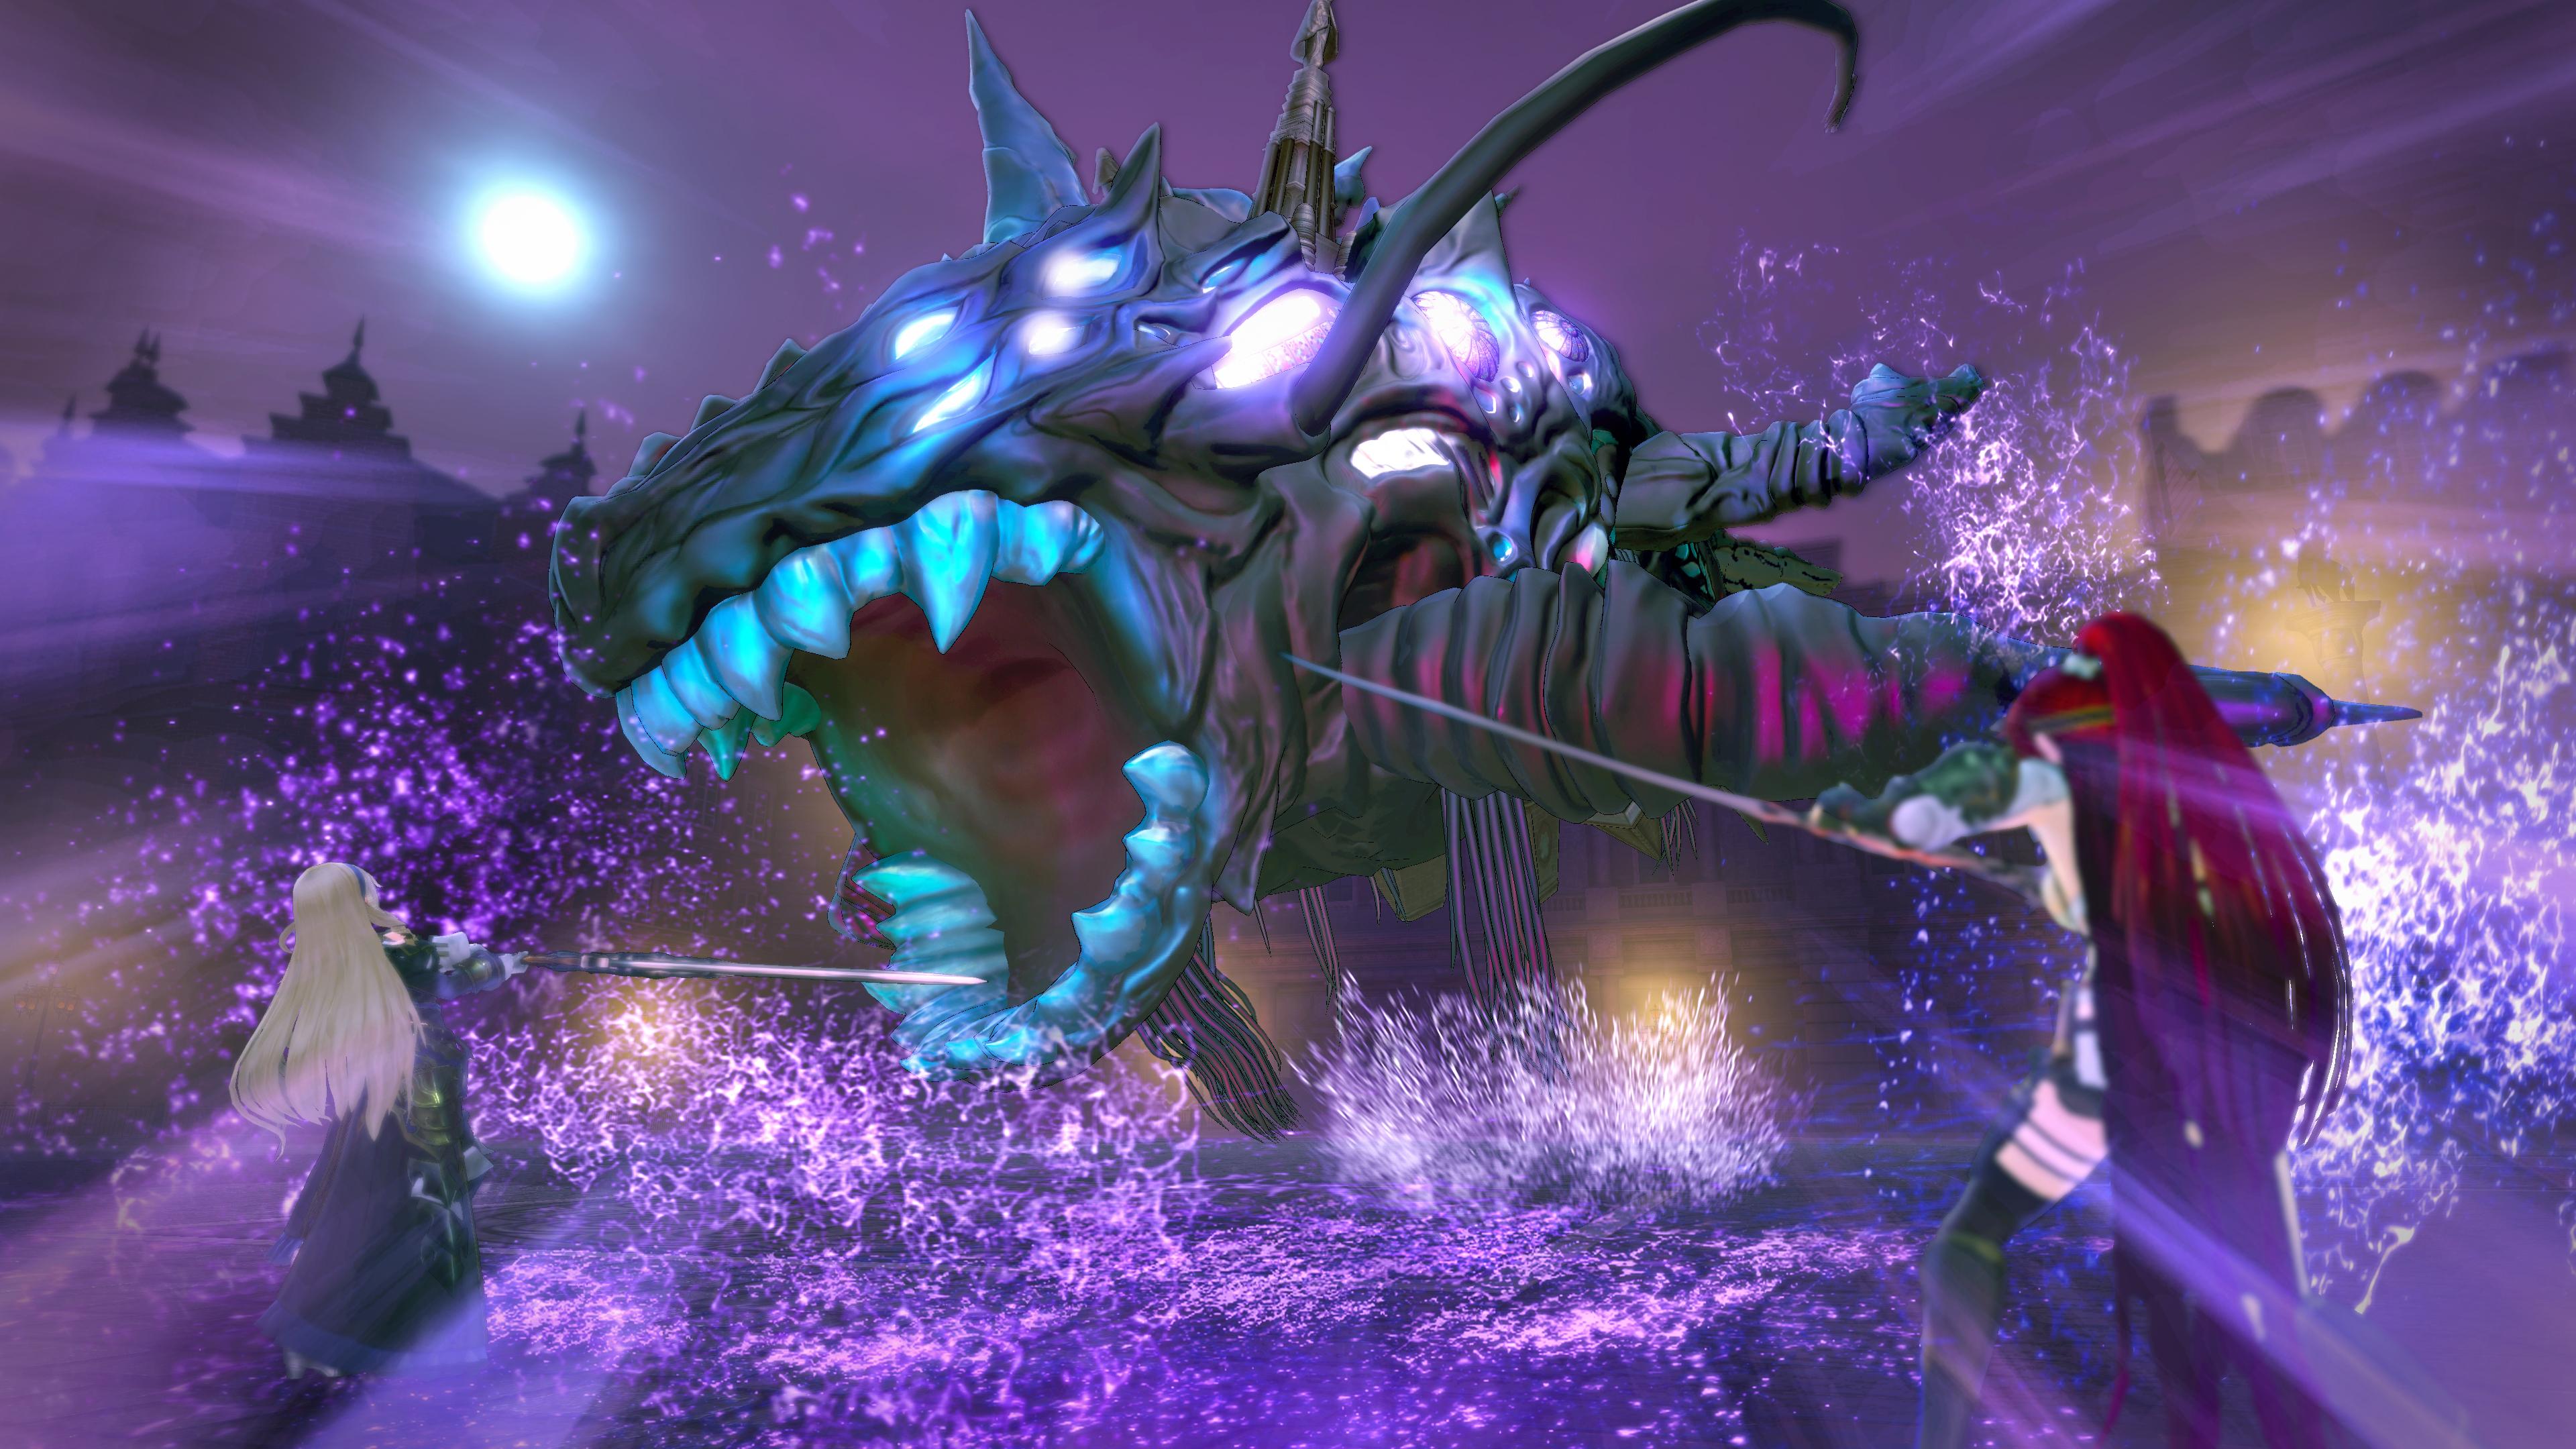 Nights of Azure 2: Bride of New Moon - monstrous